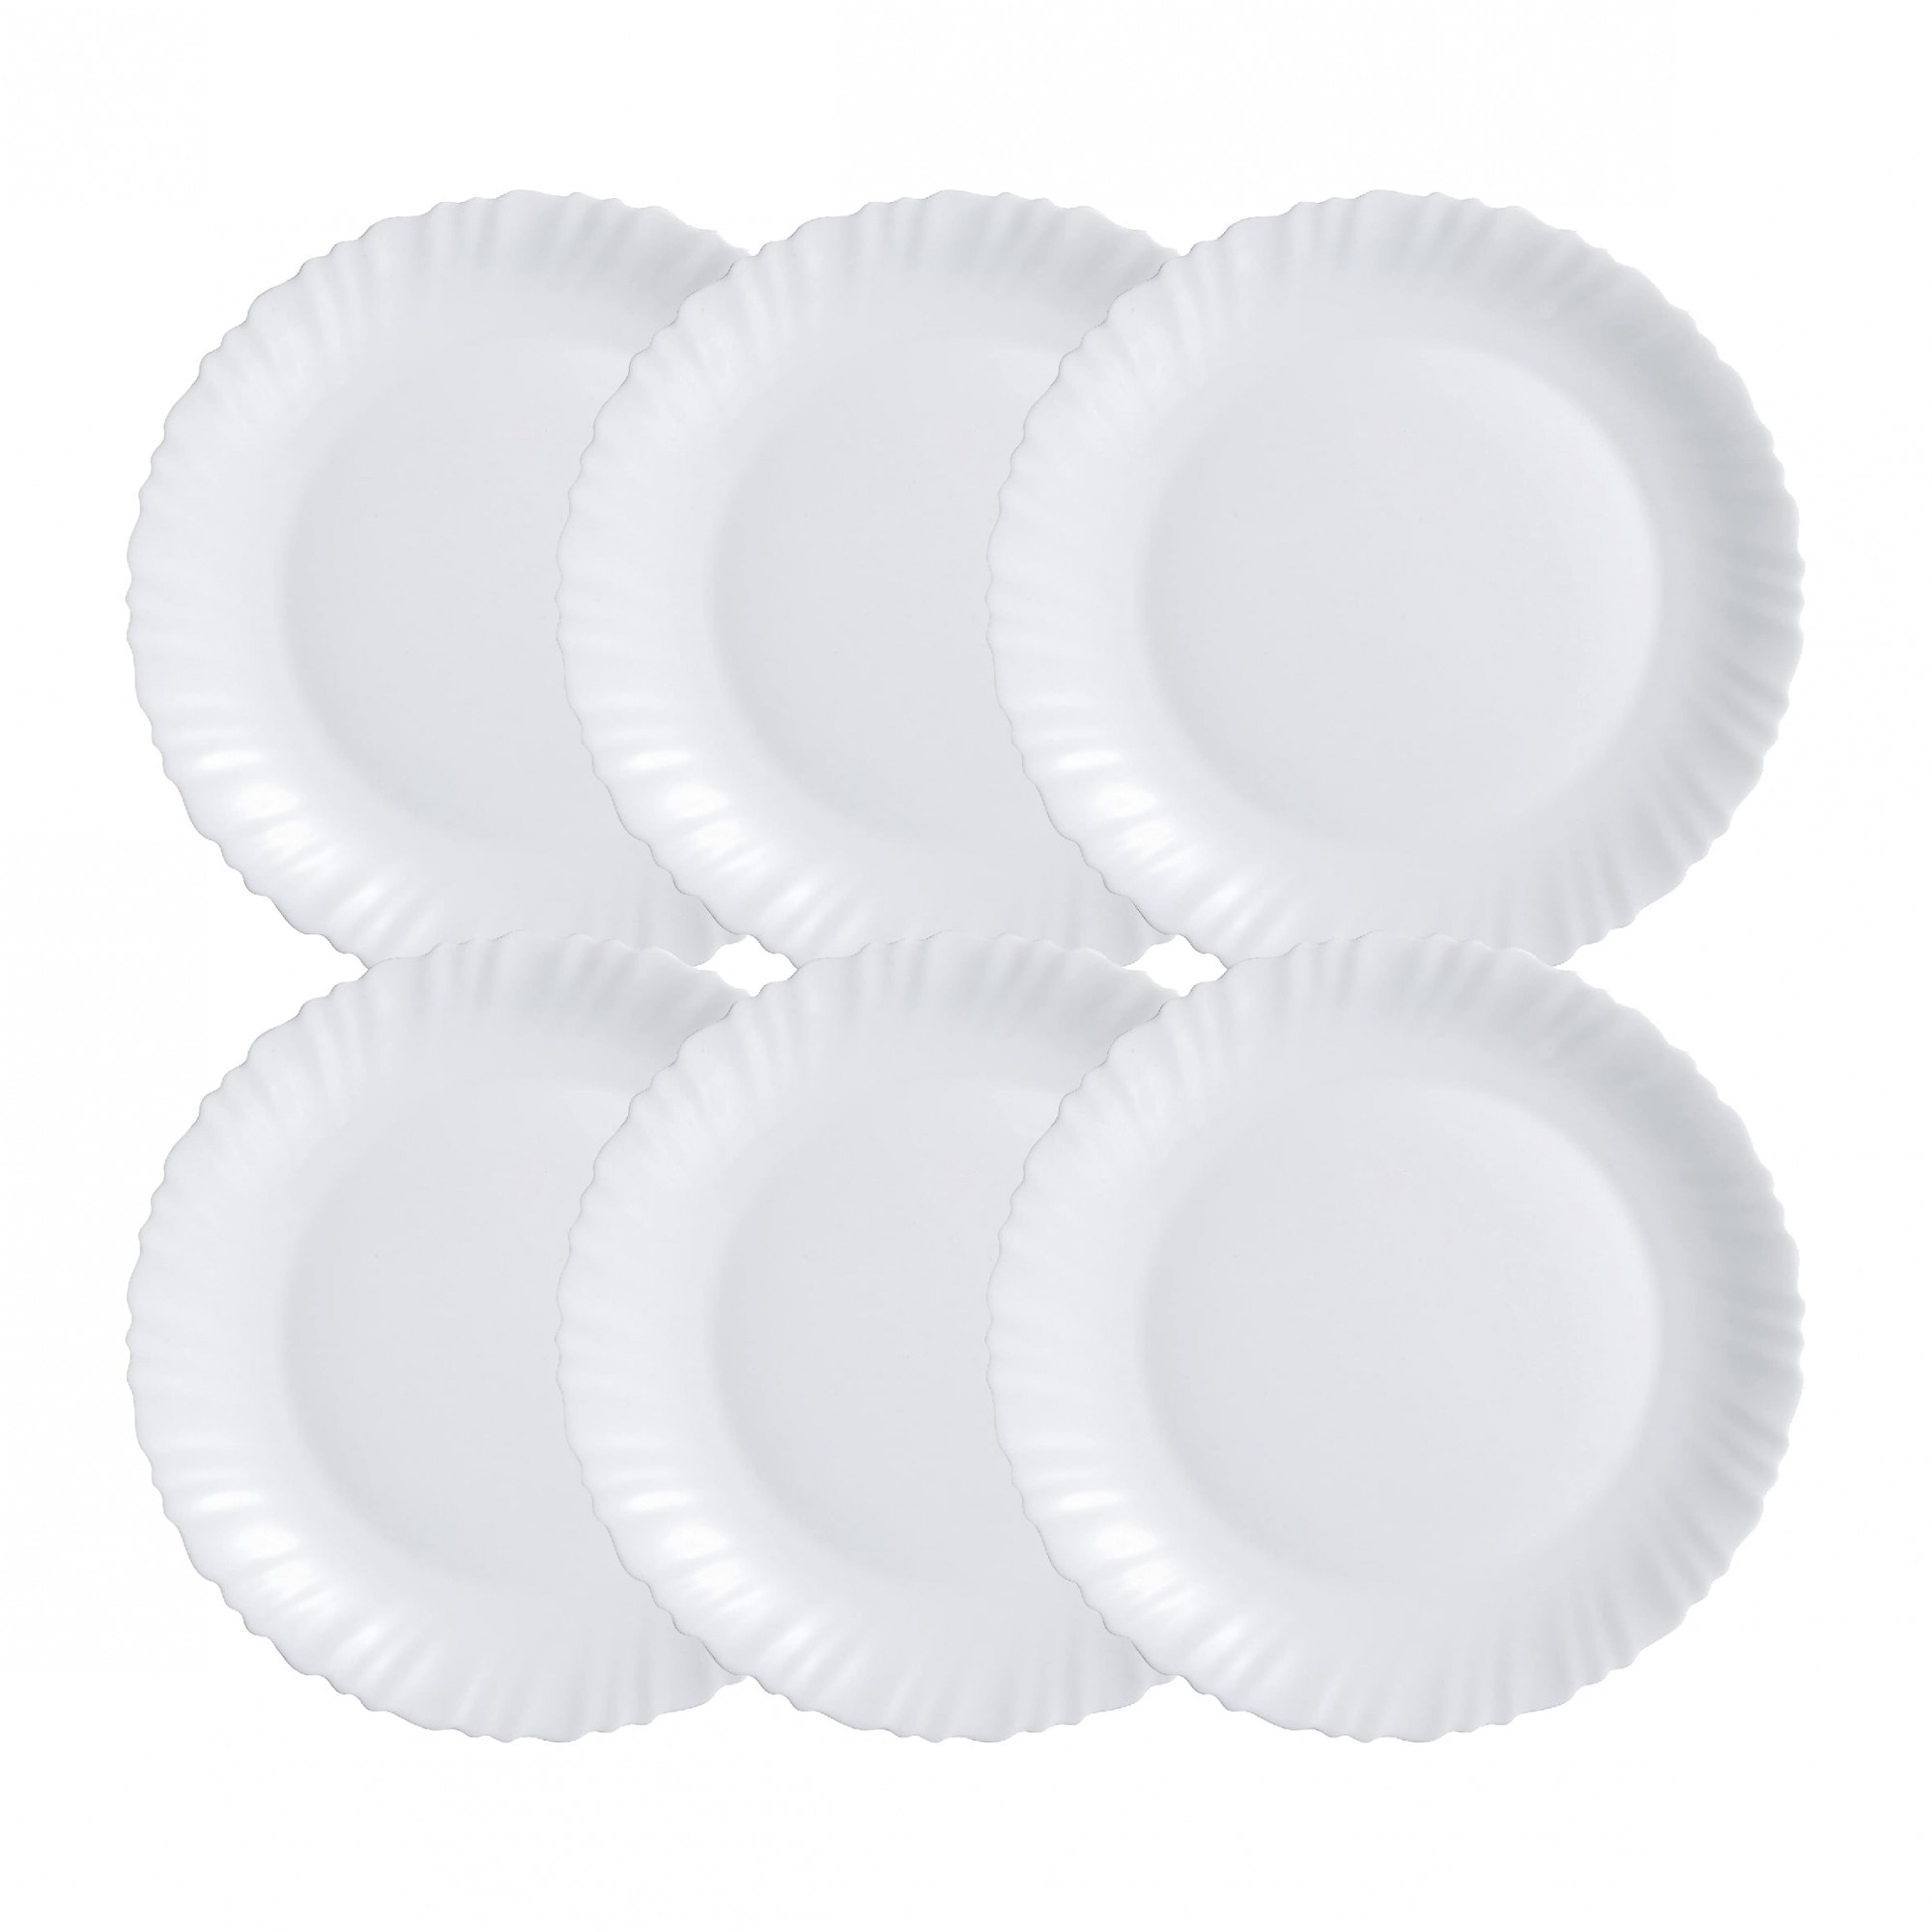 Jogo de Pratos de Vidro Branco Luminarc Sobremesa 6 Pcs